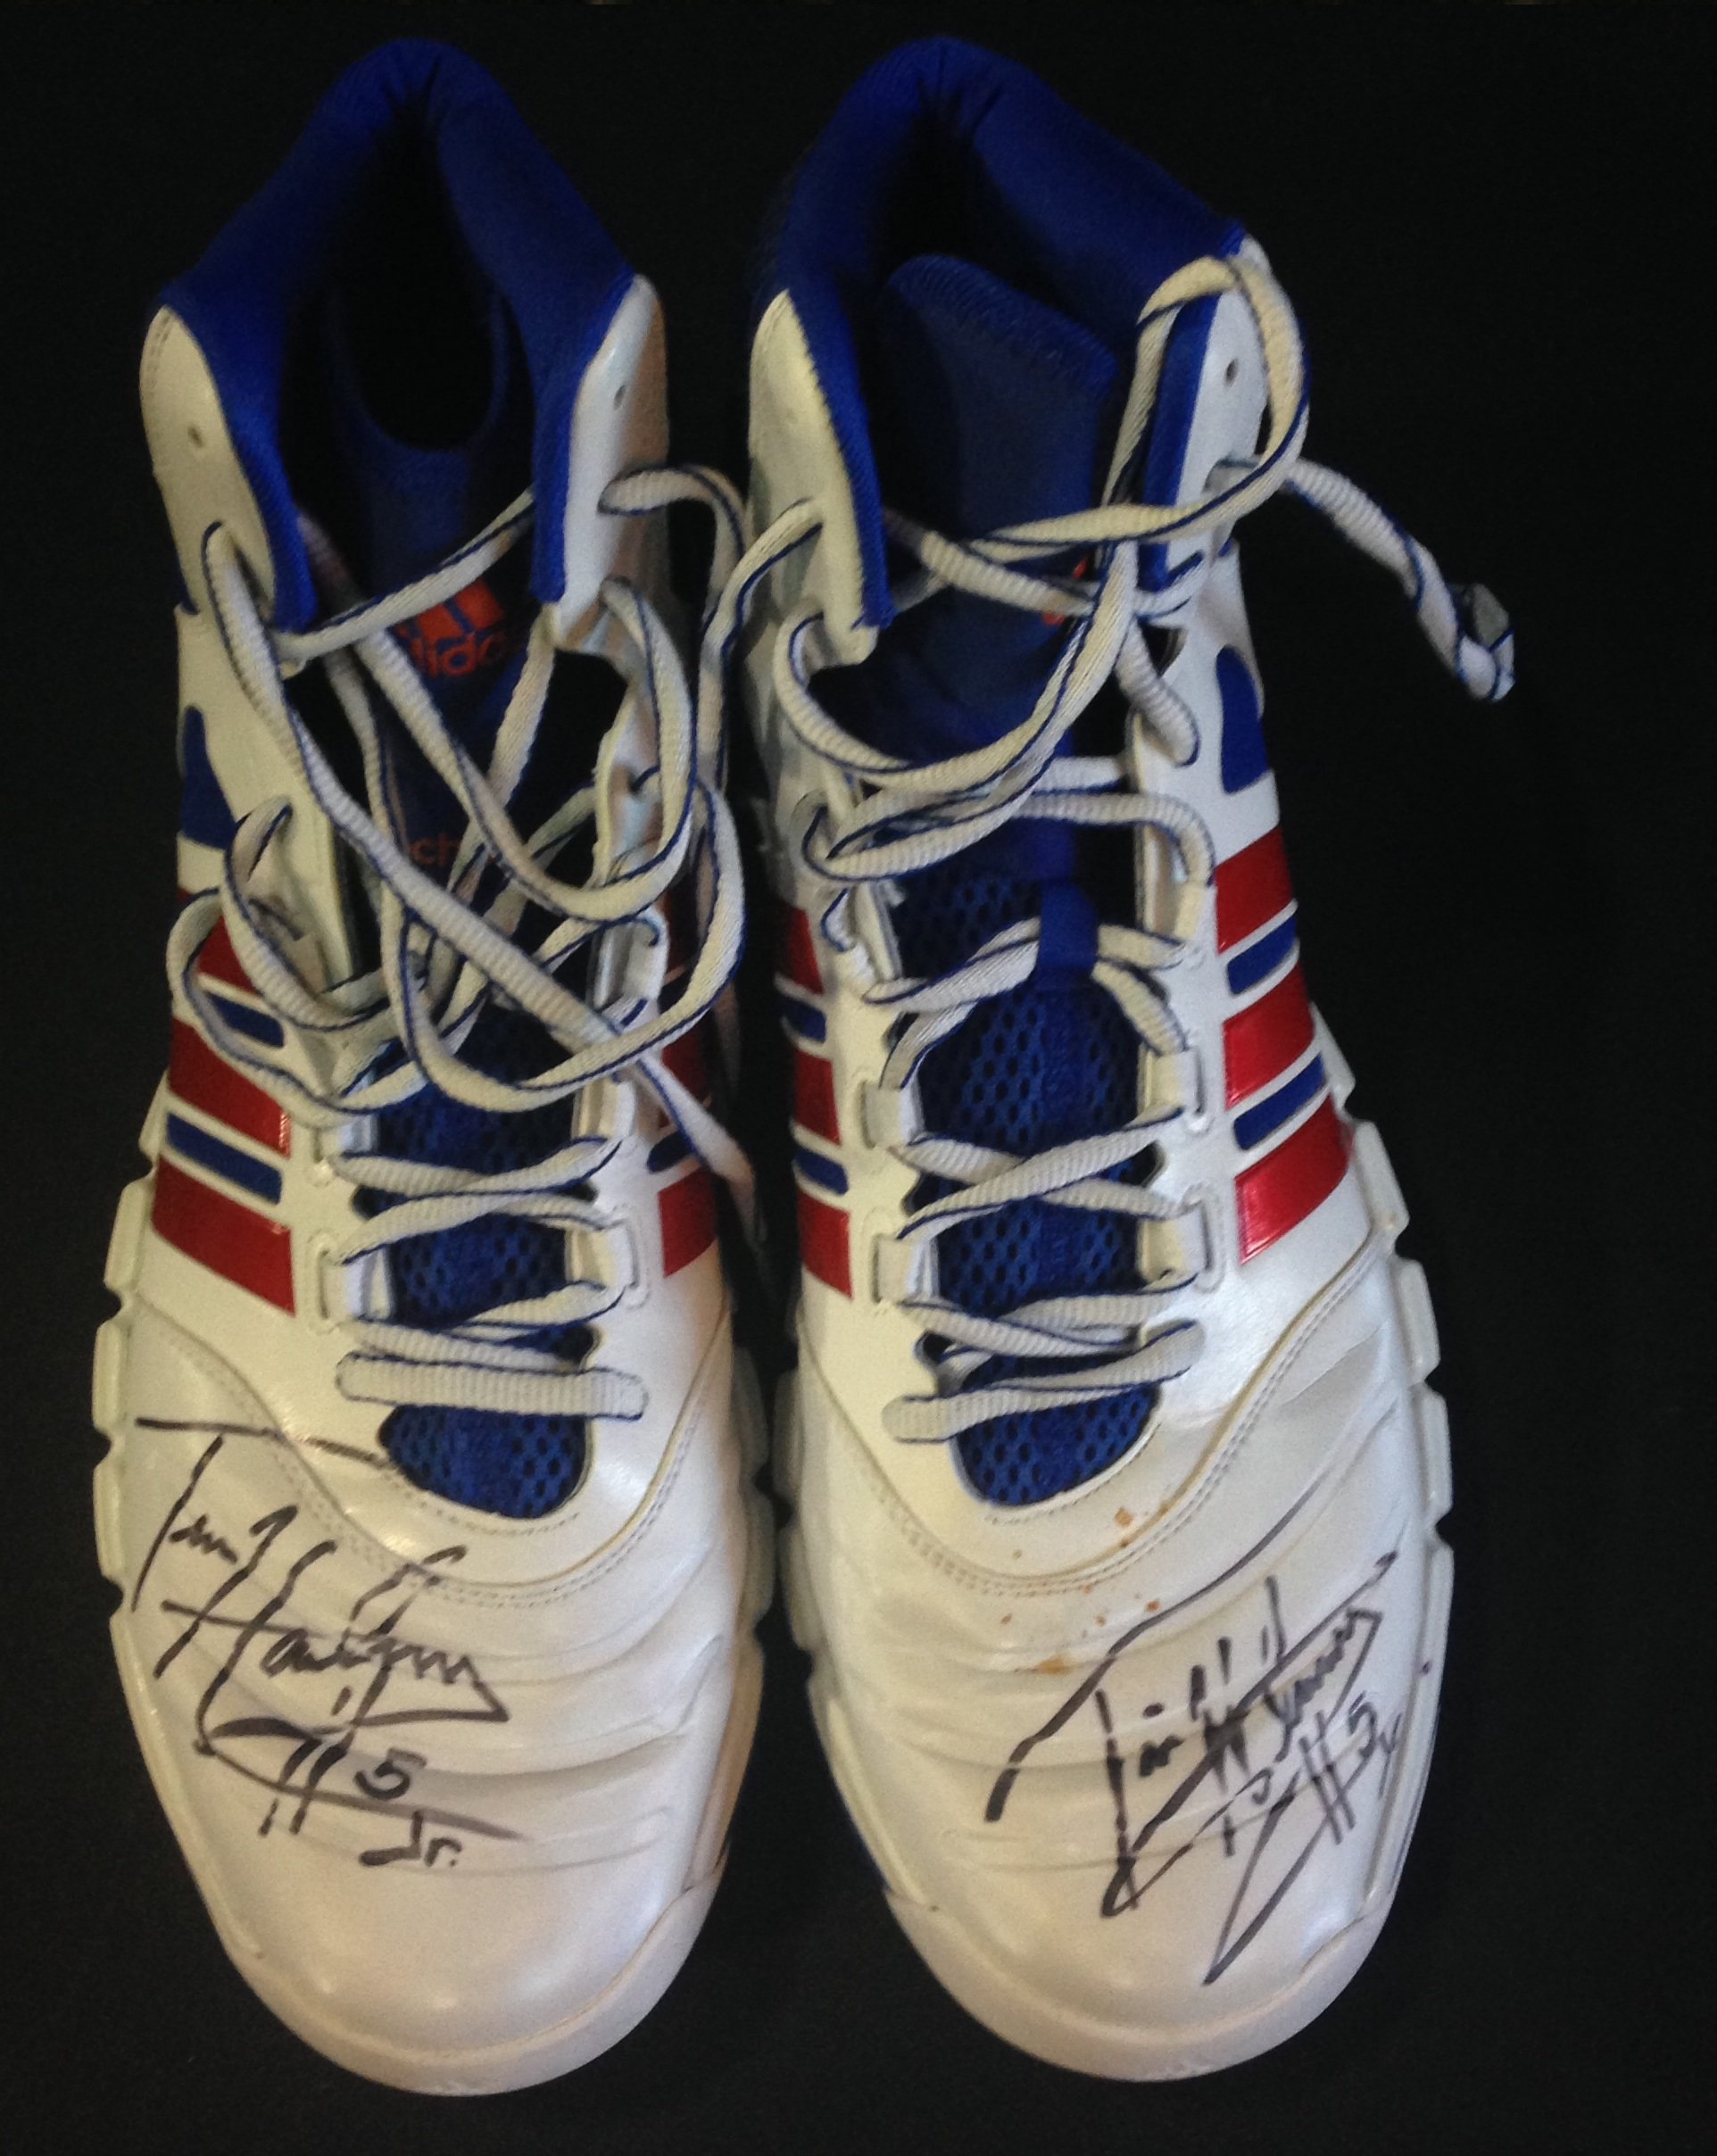 tim hardaway jr knicks hawks signed game used sneaker